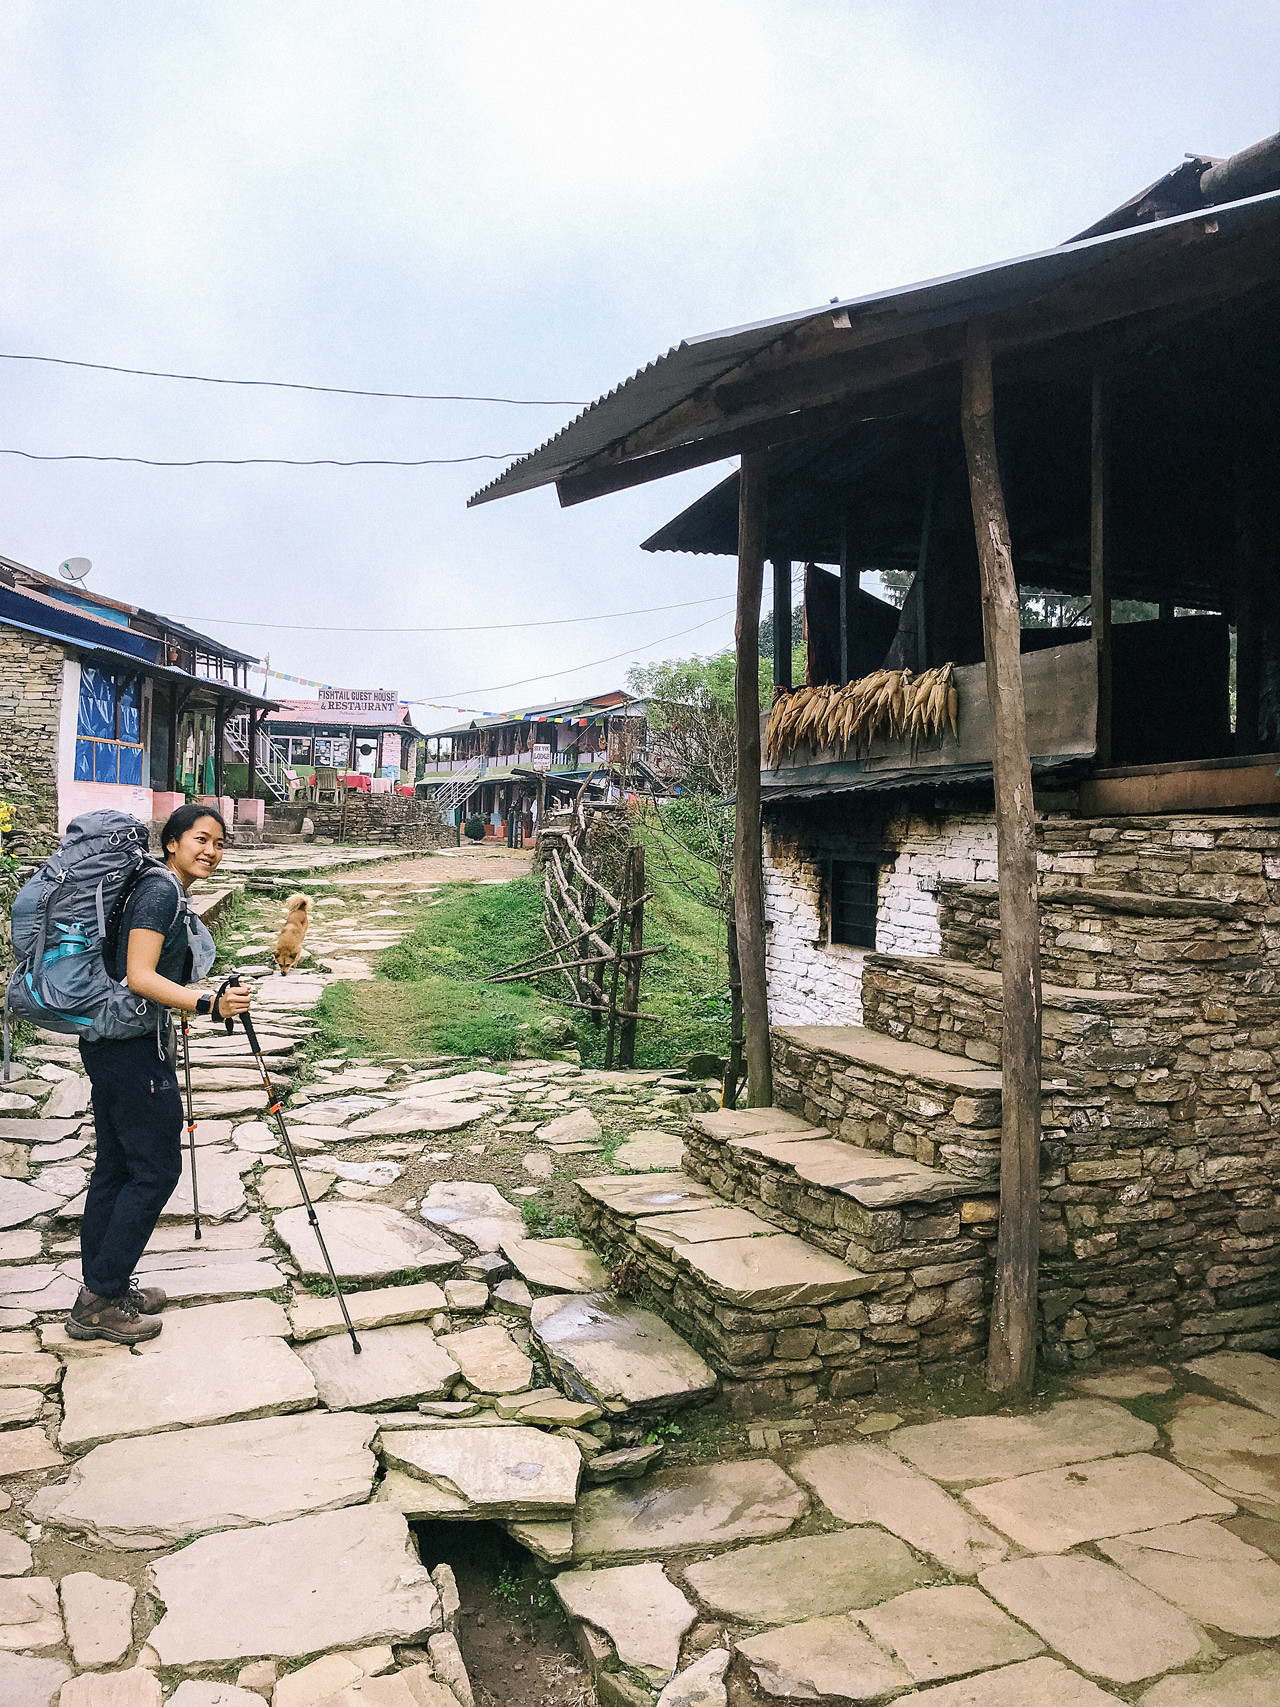 Nepal 2019 - Trekking Annapurna Base Camp 45